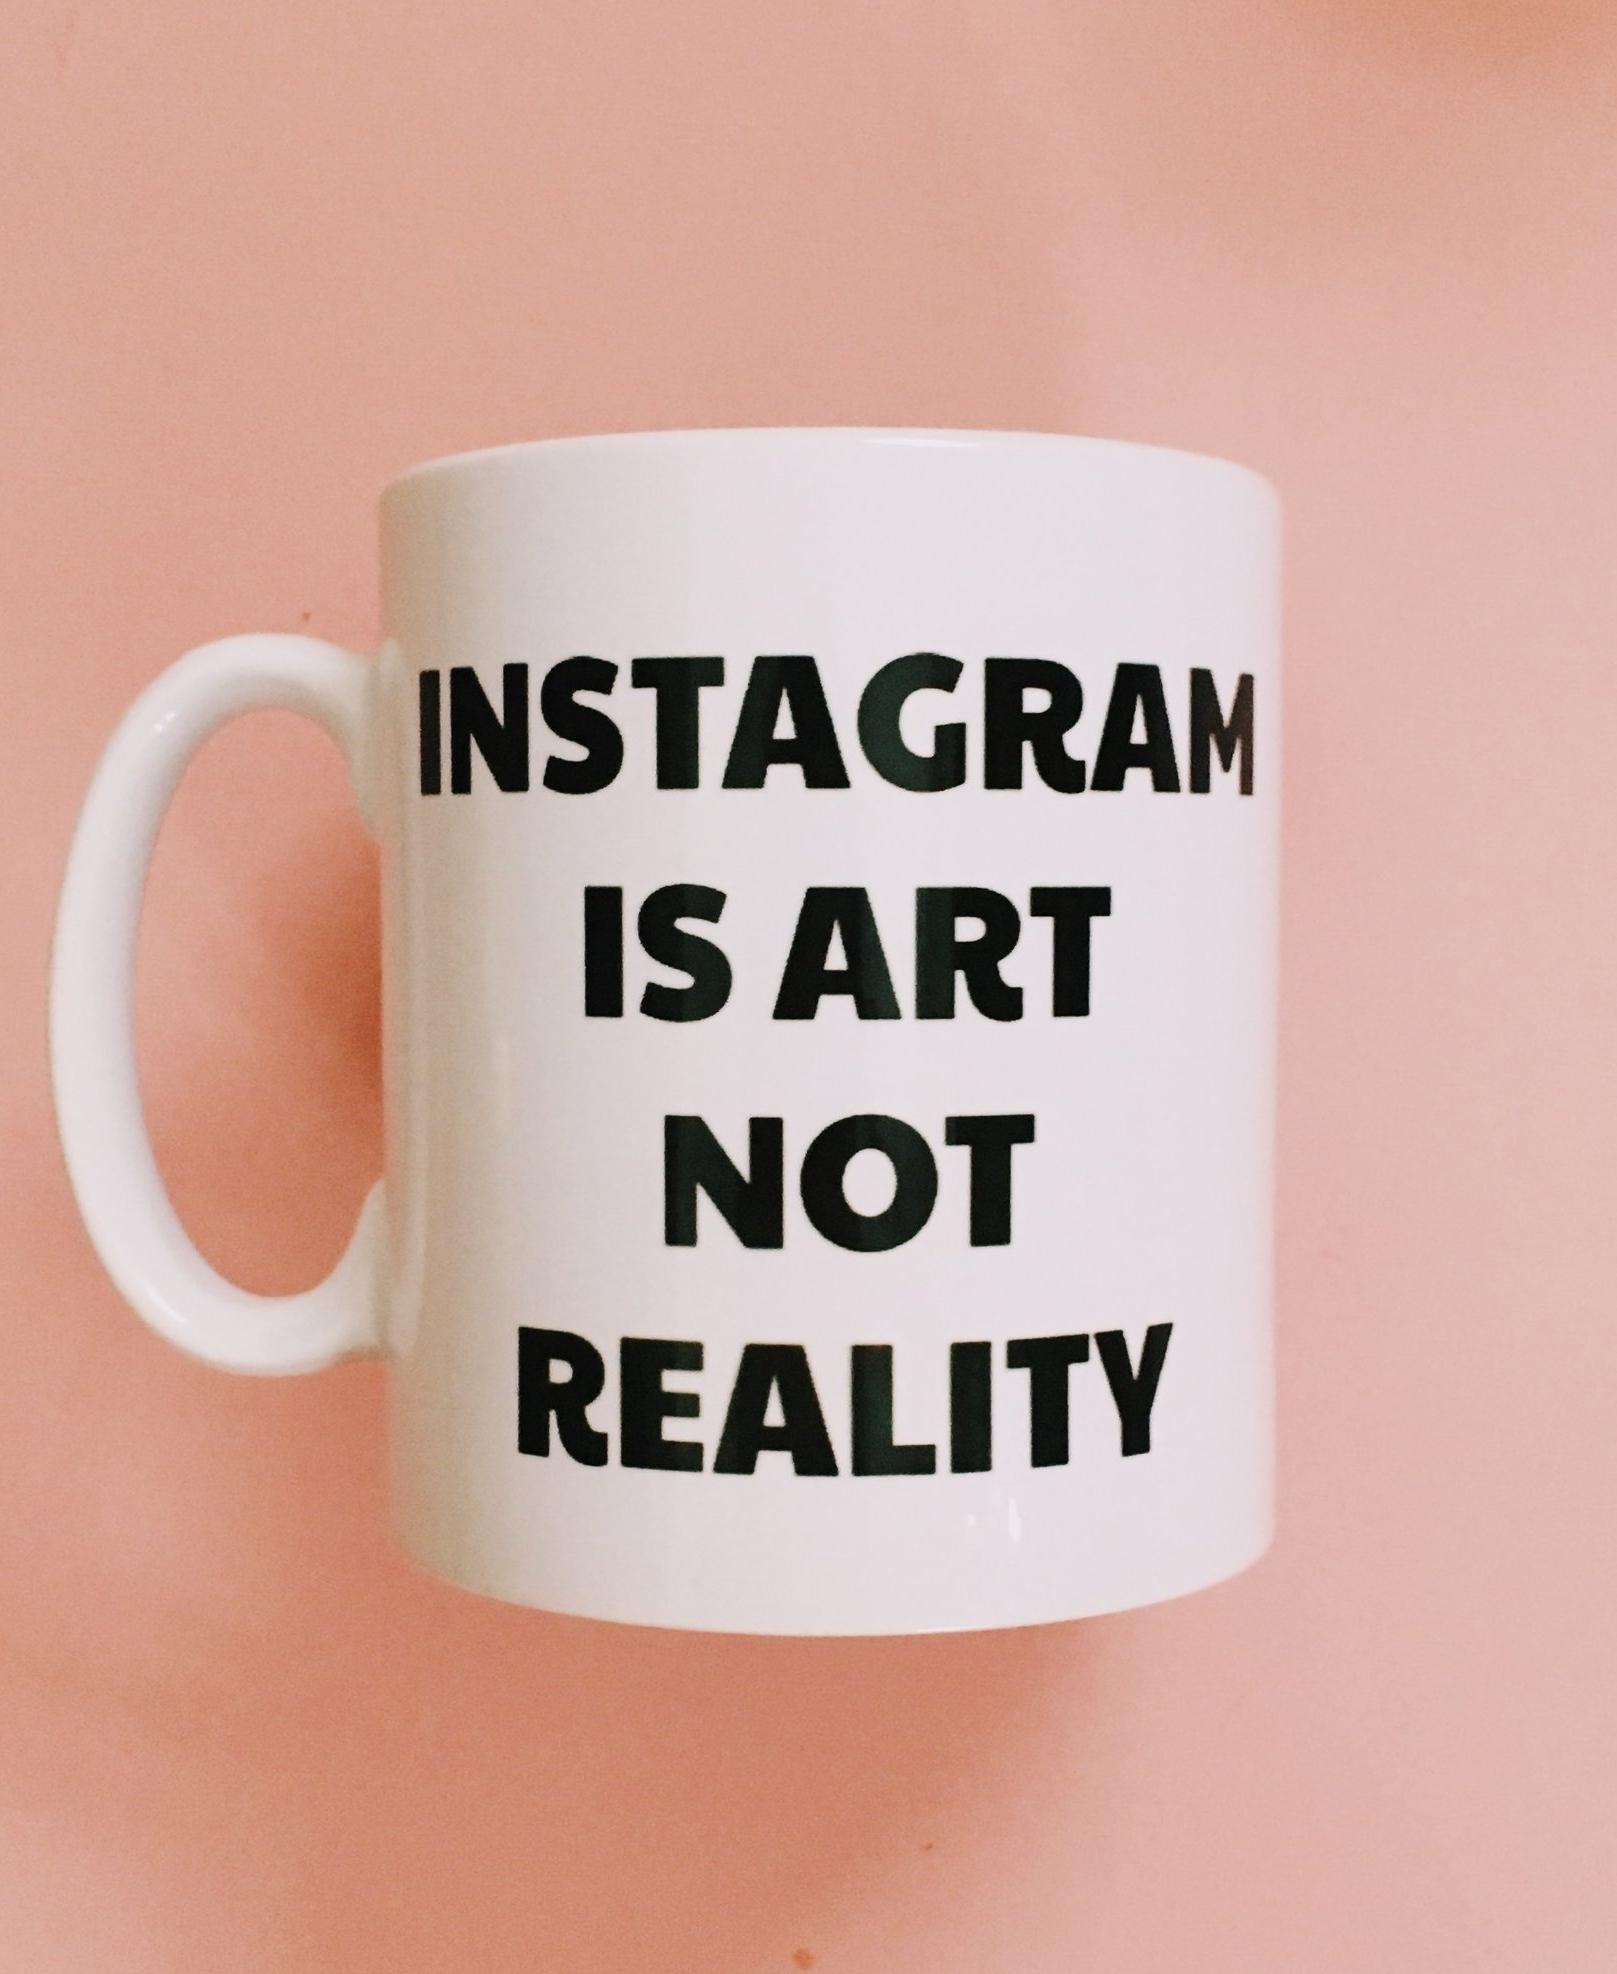 Instagram Is Art Mug  - £10  Coco Roses Apparel